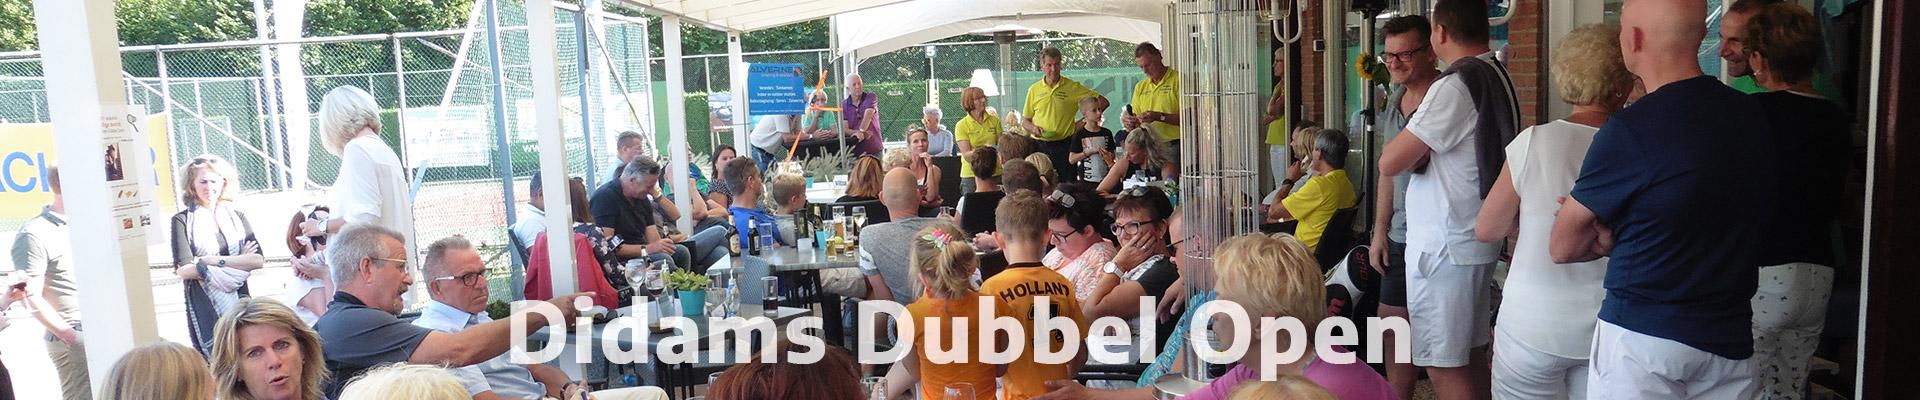 tvd_slider_didams_dubbel_open